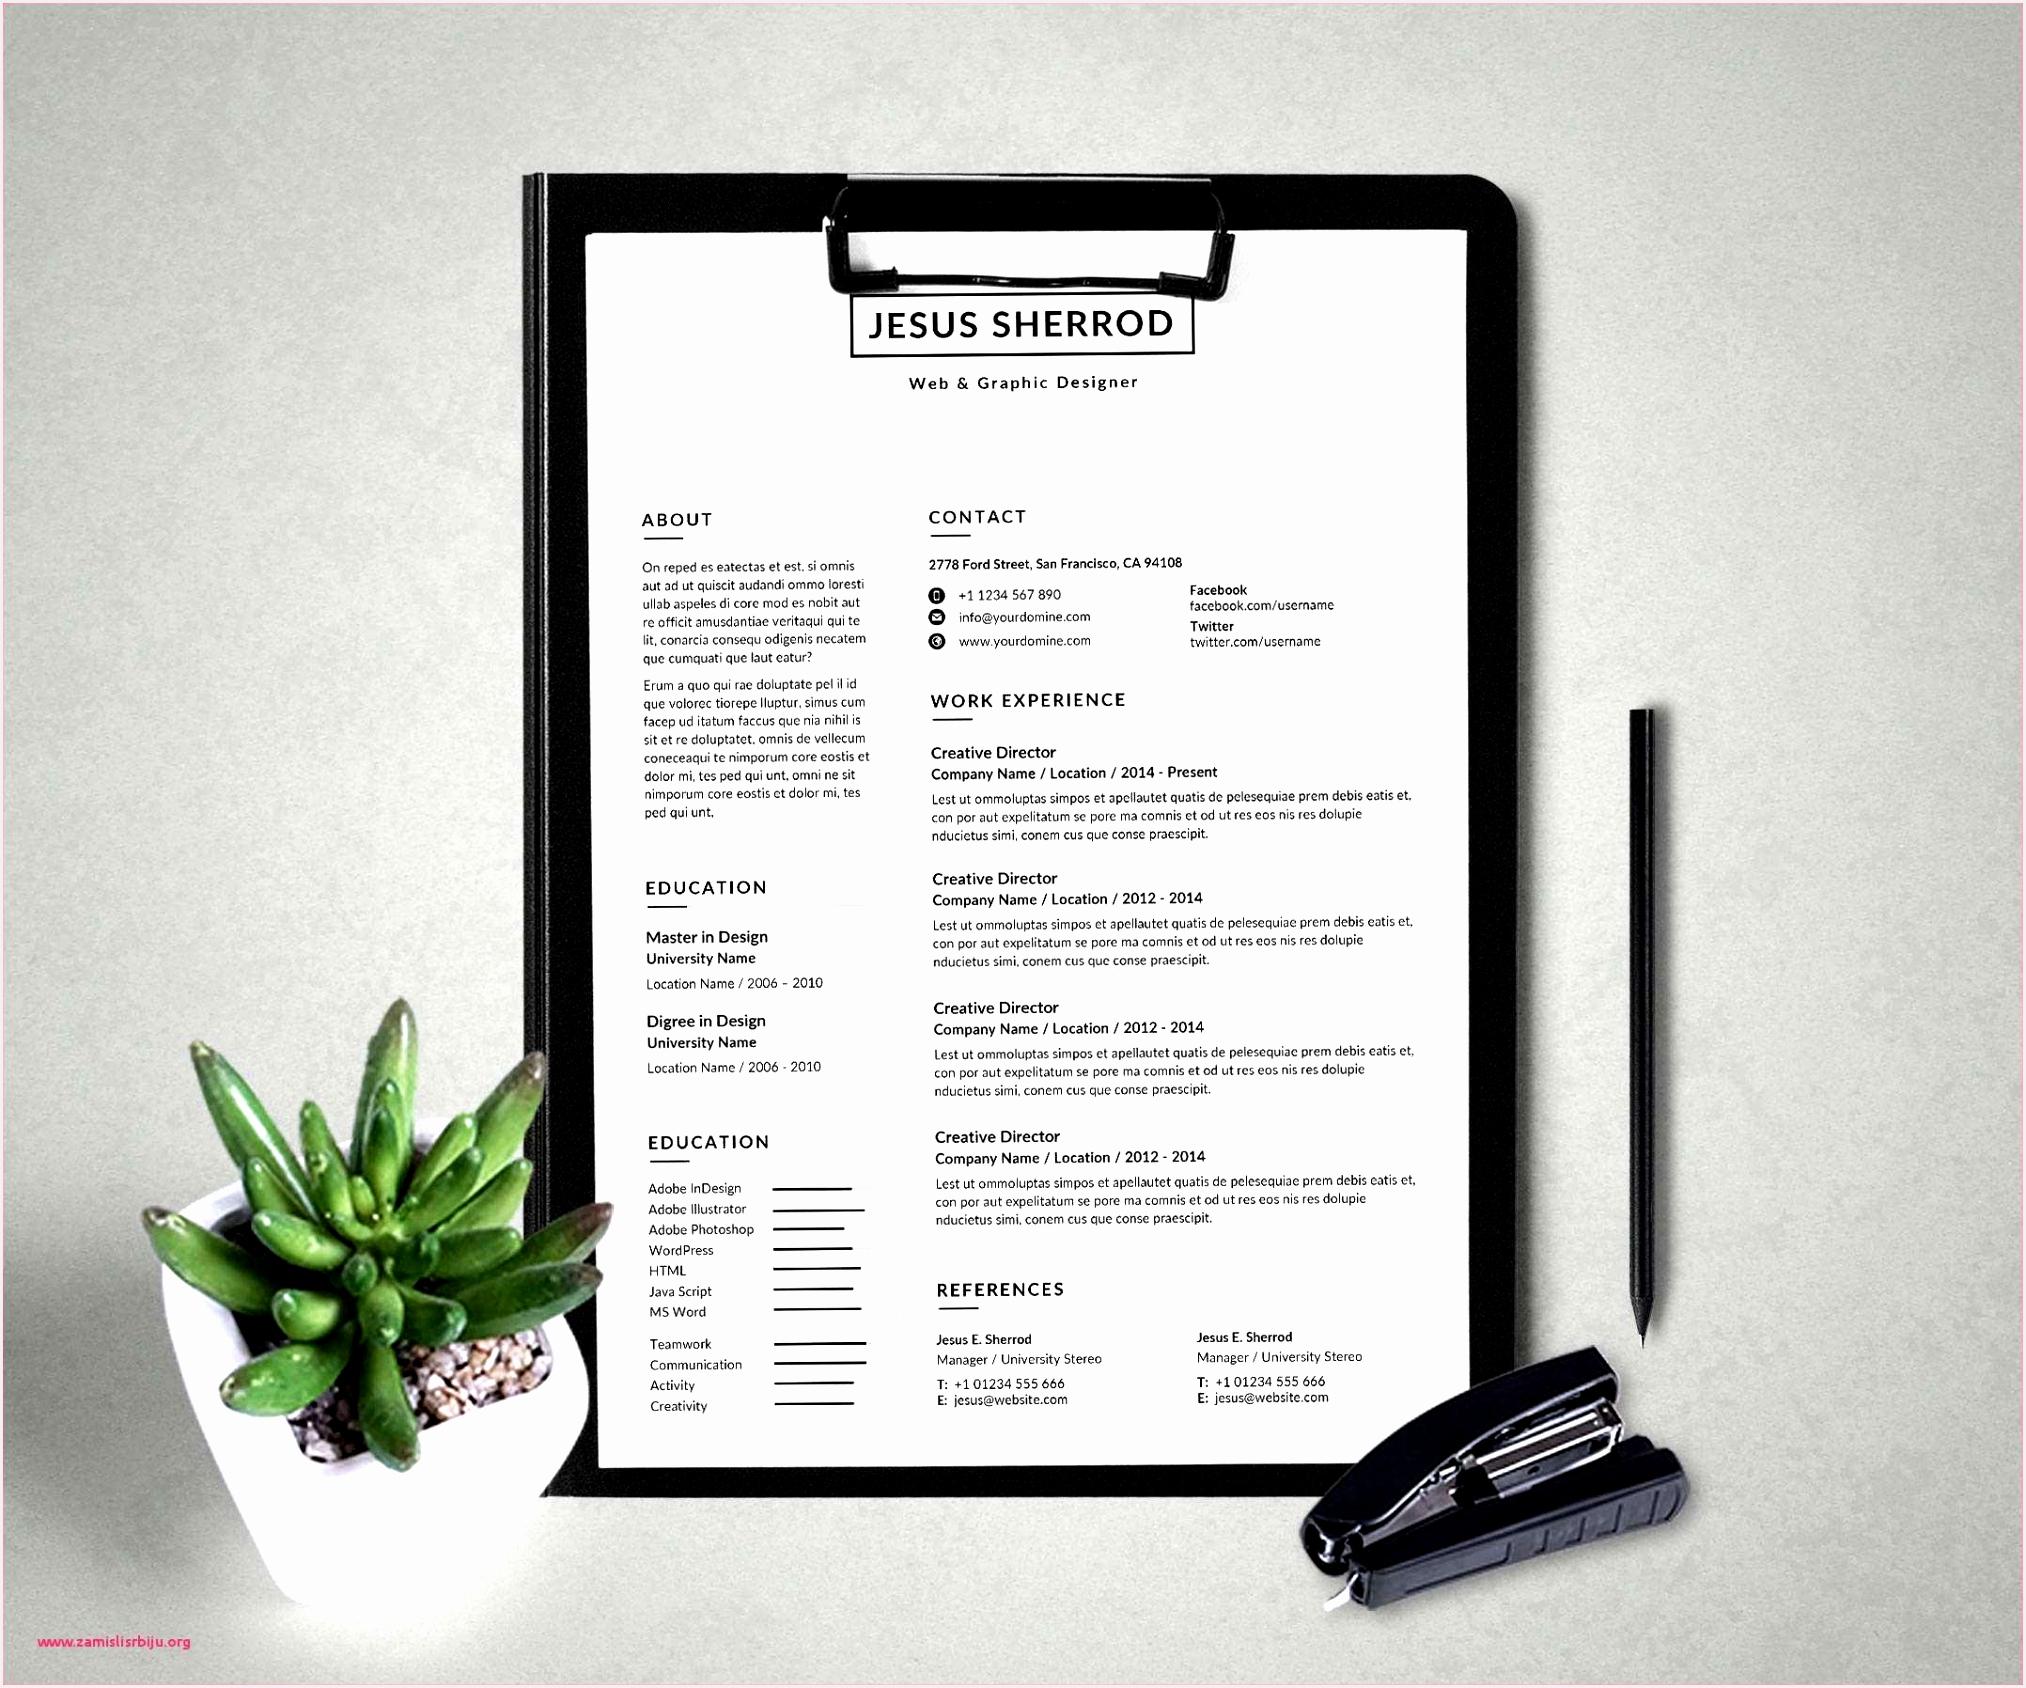 Game Animator Sample Resume Uebfg Beautiful Web Designer Resume Samples Web Developer Resume Examples Awesome Of 5 Game Animator Sample Resume